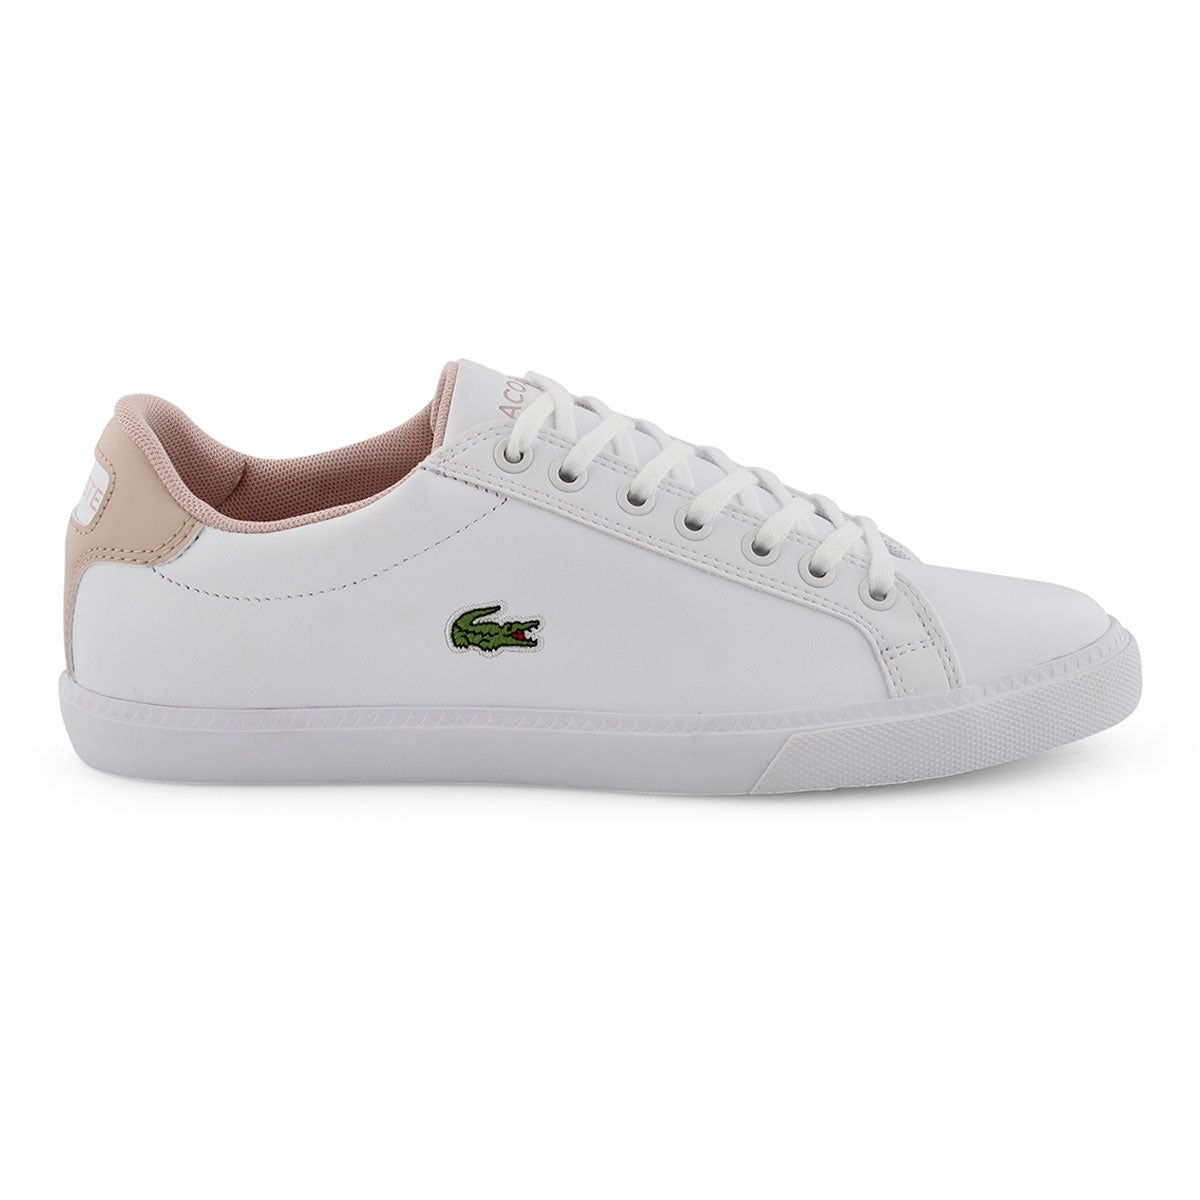 Lds Grad Vulc 119 2 P wht/lt pnk sneaker